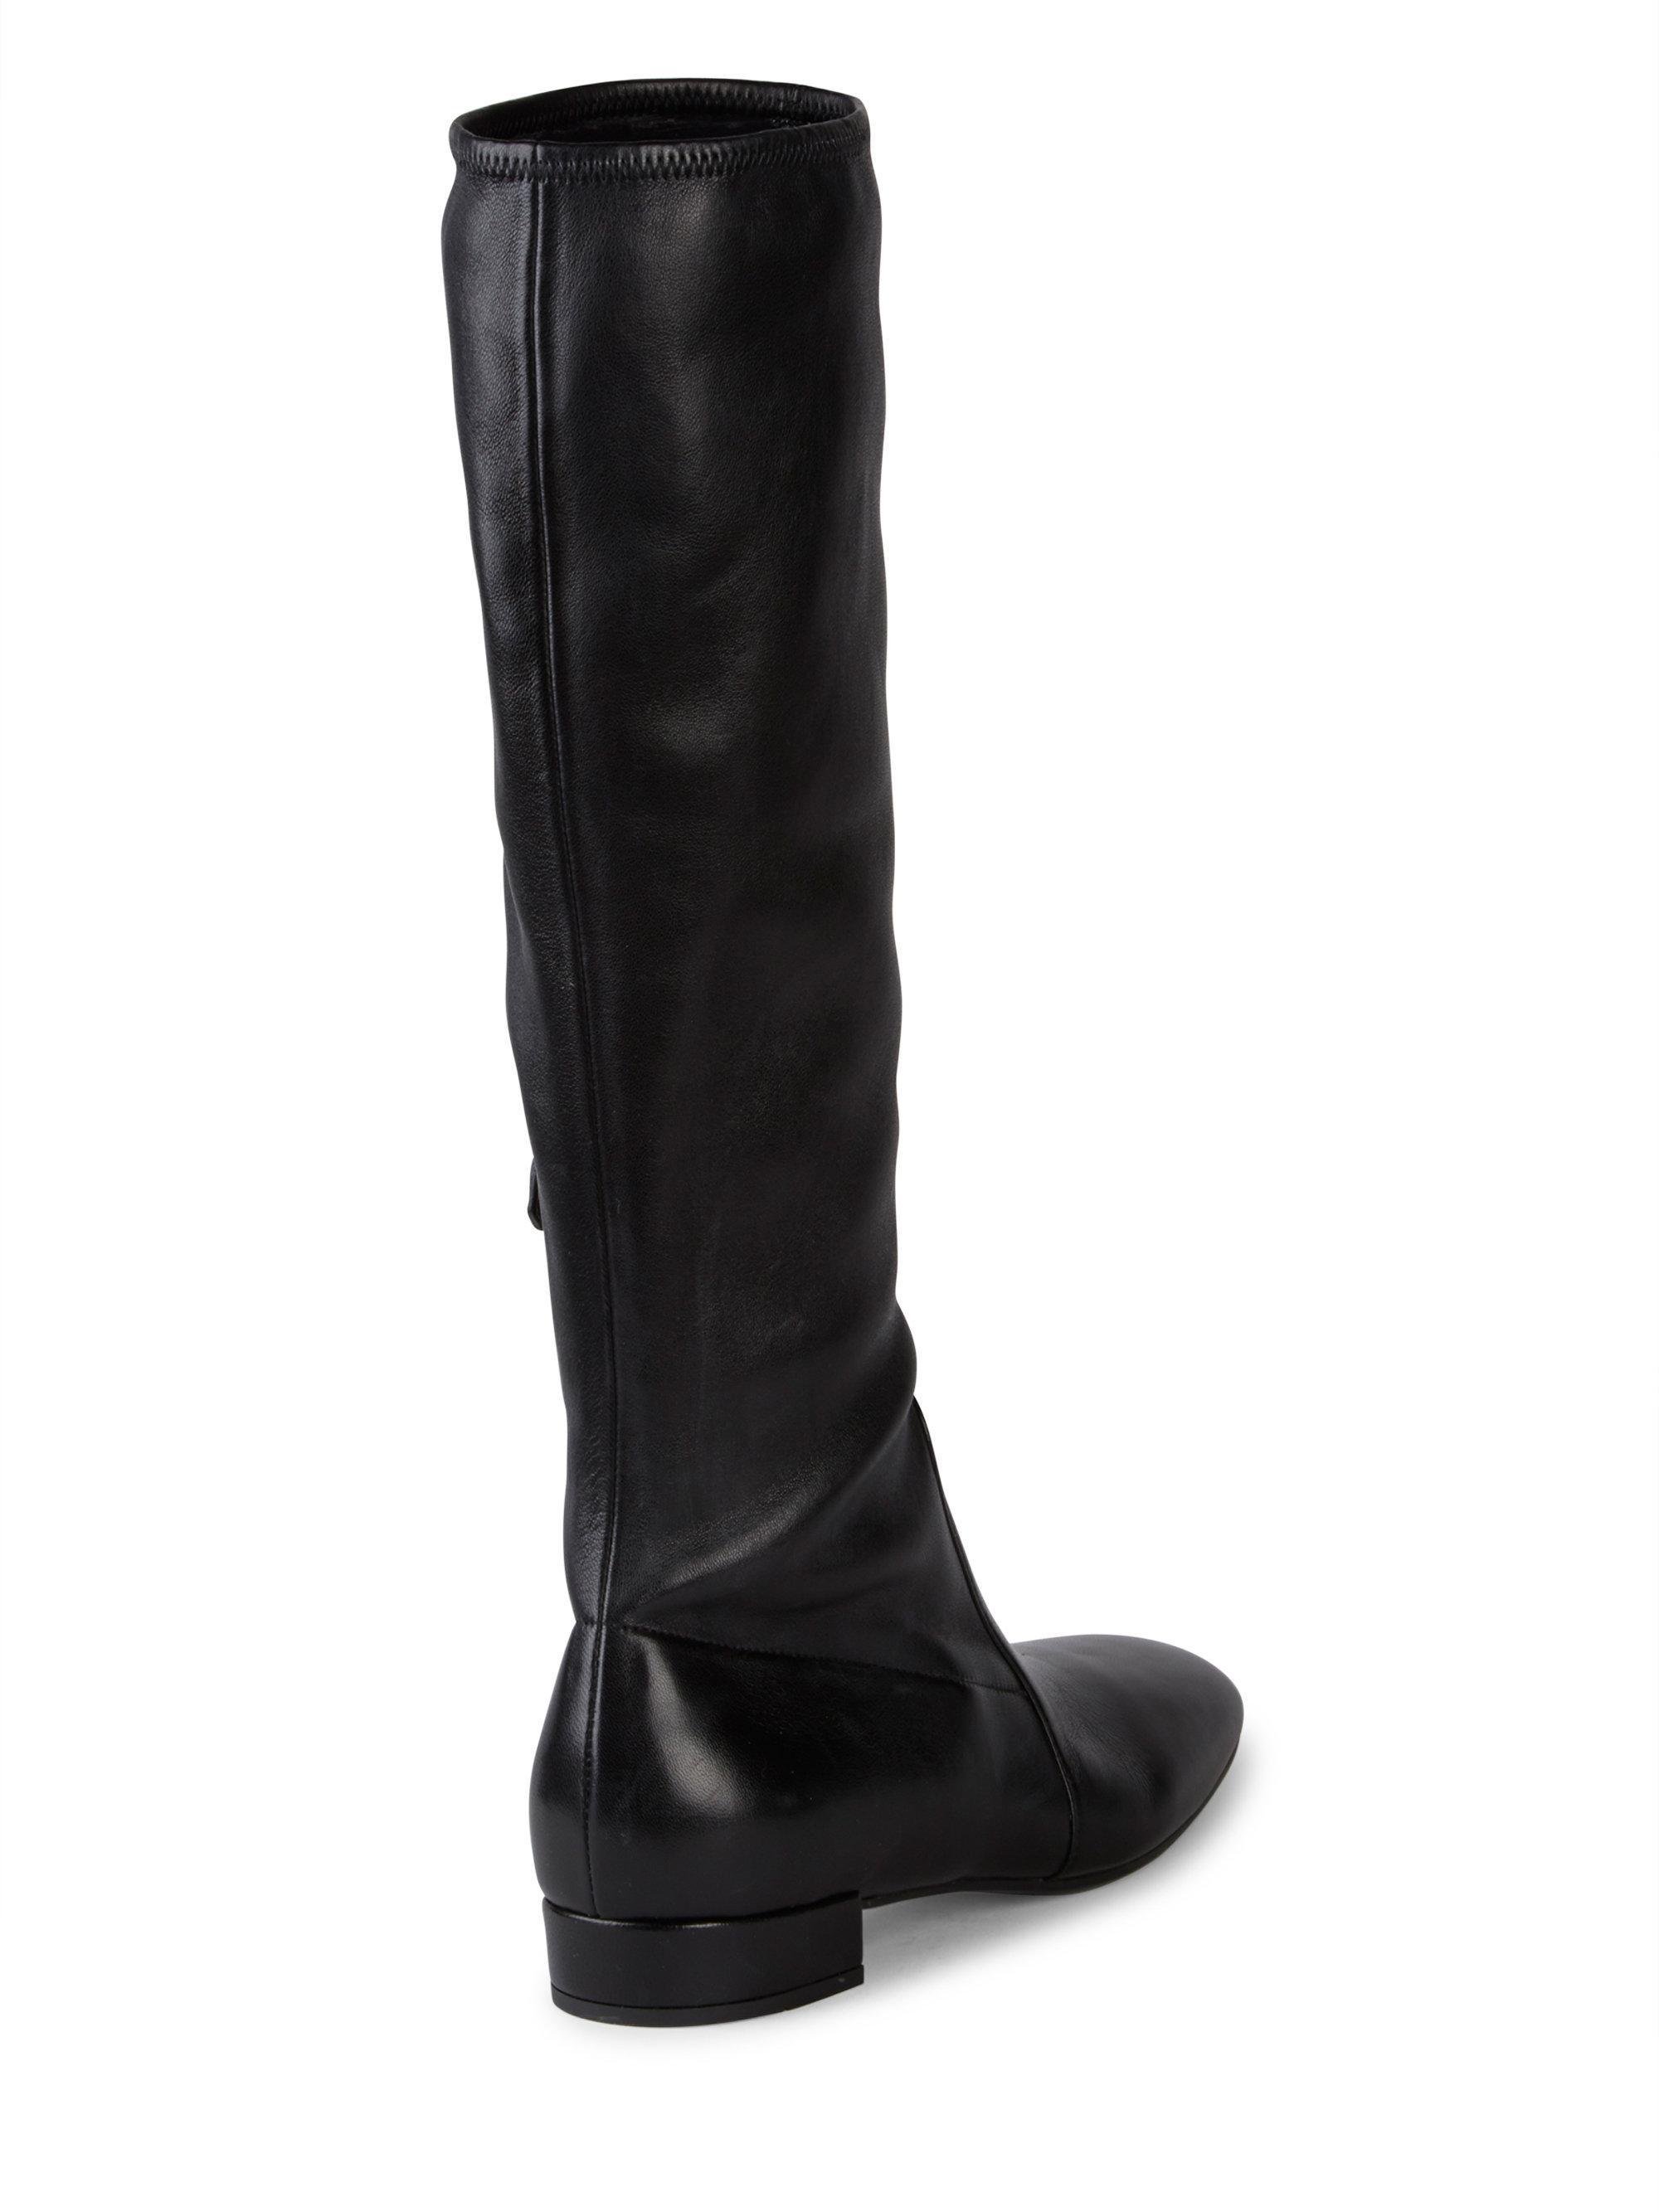 Prada Stretch Leather Tall Boots DdNBusMJ